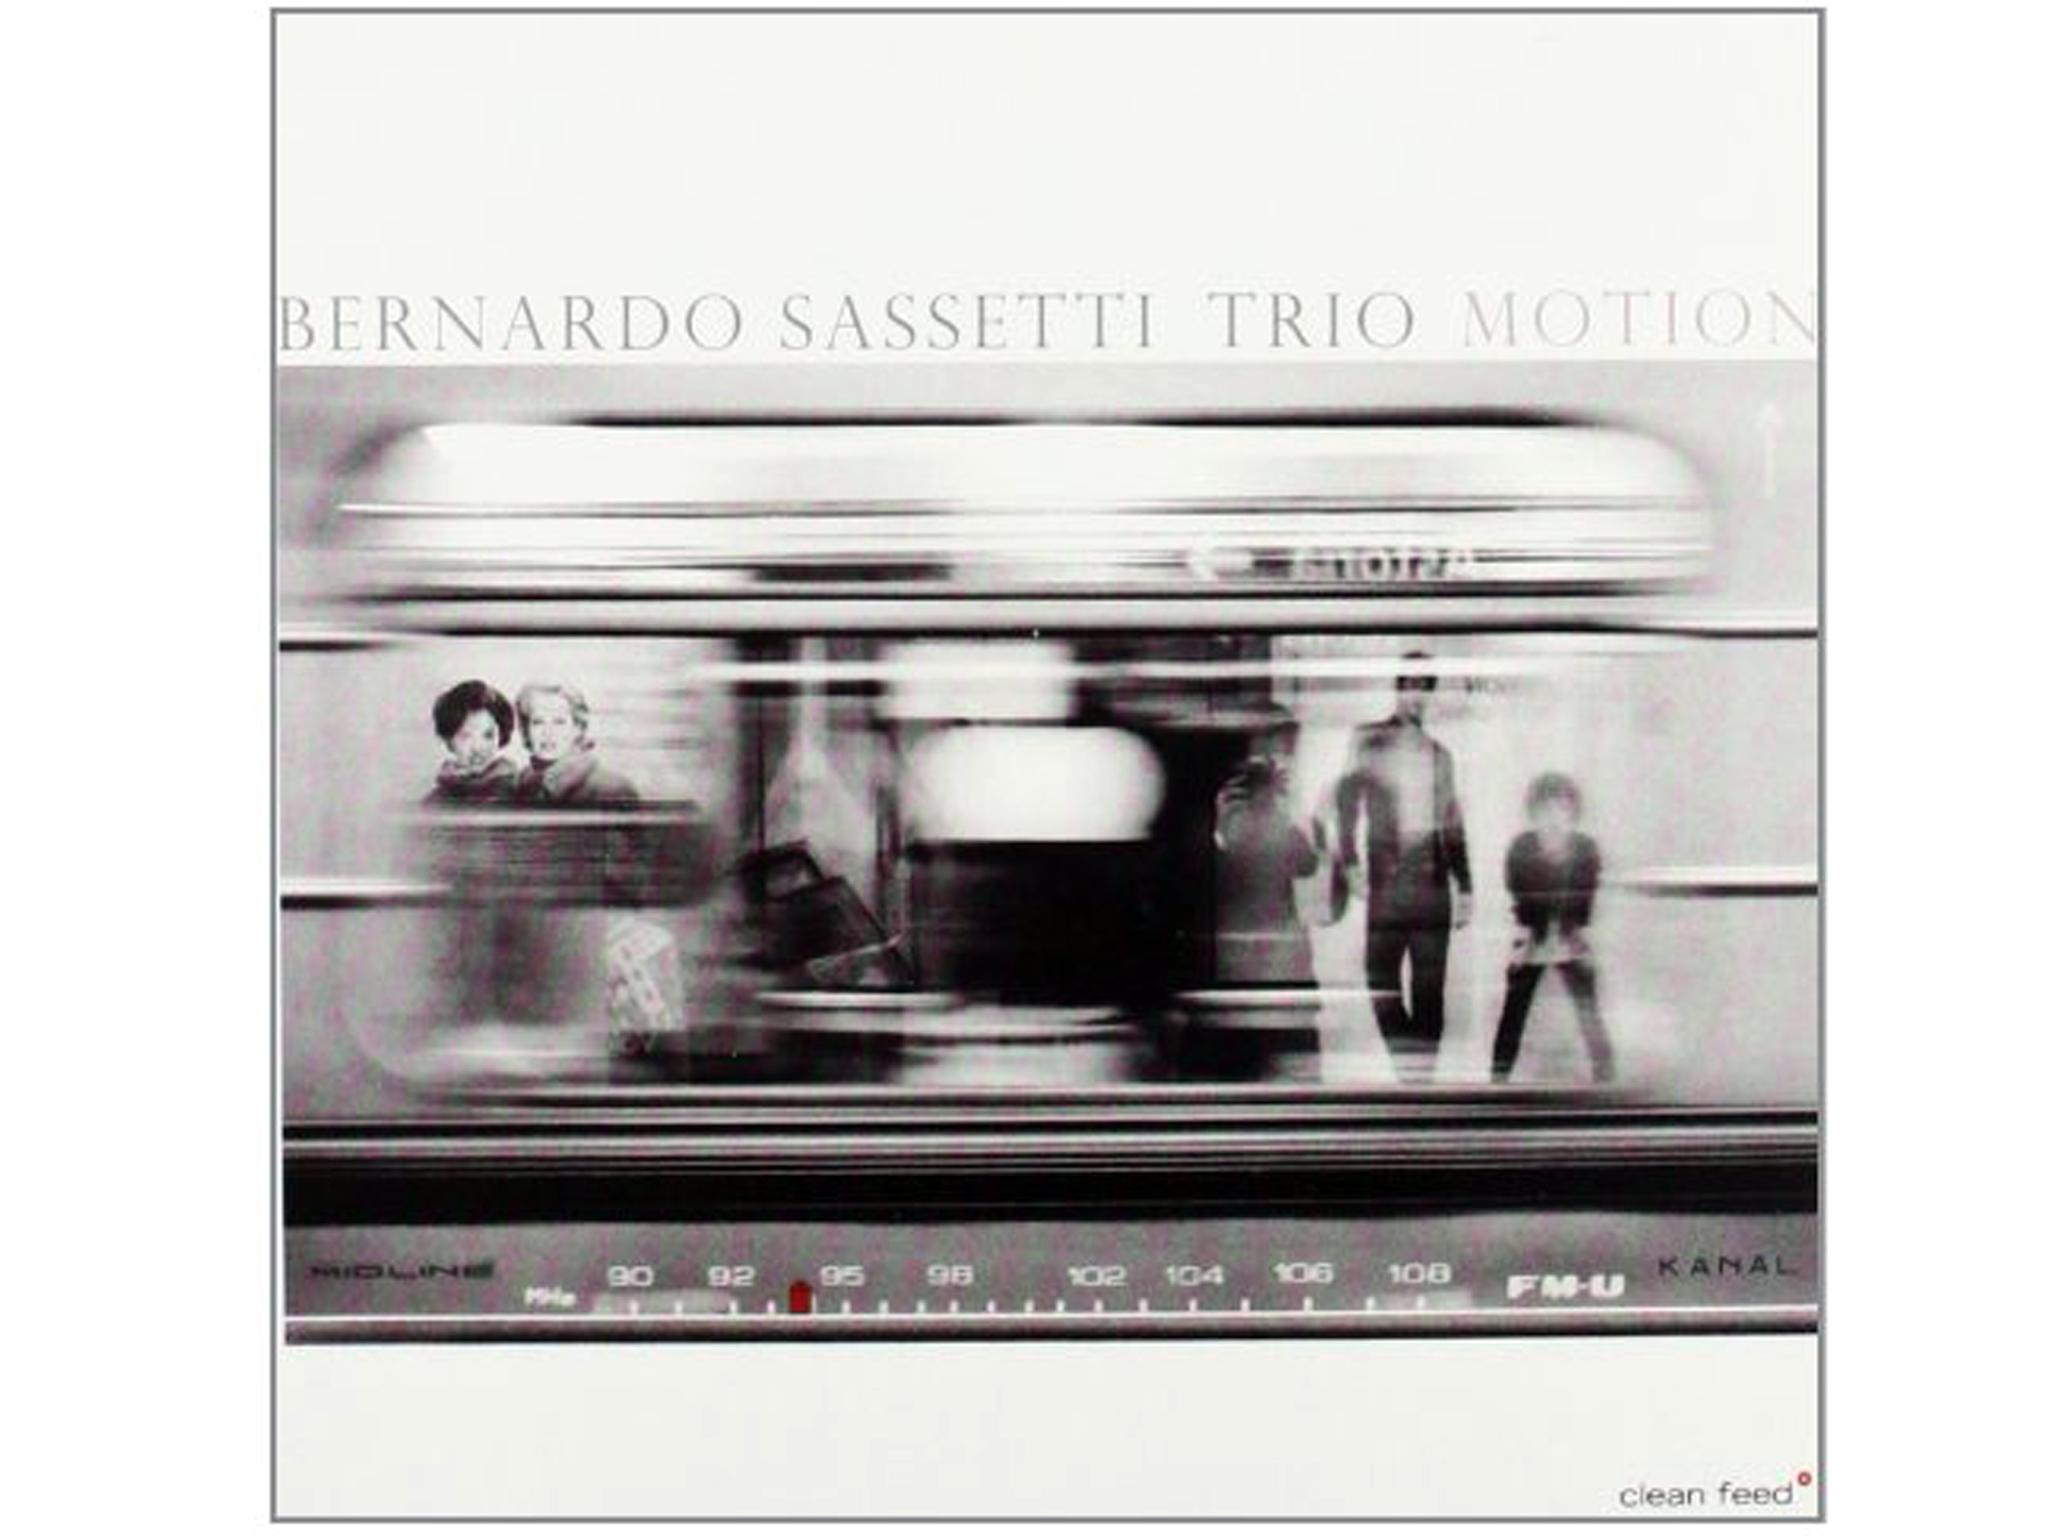 Bernardo Sassetti Trio - Motion